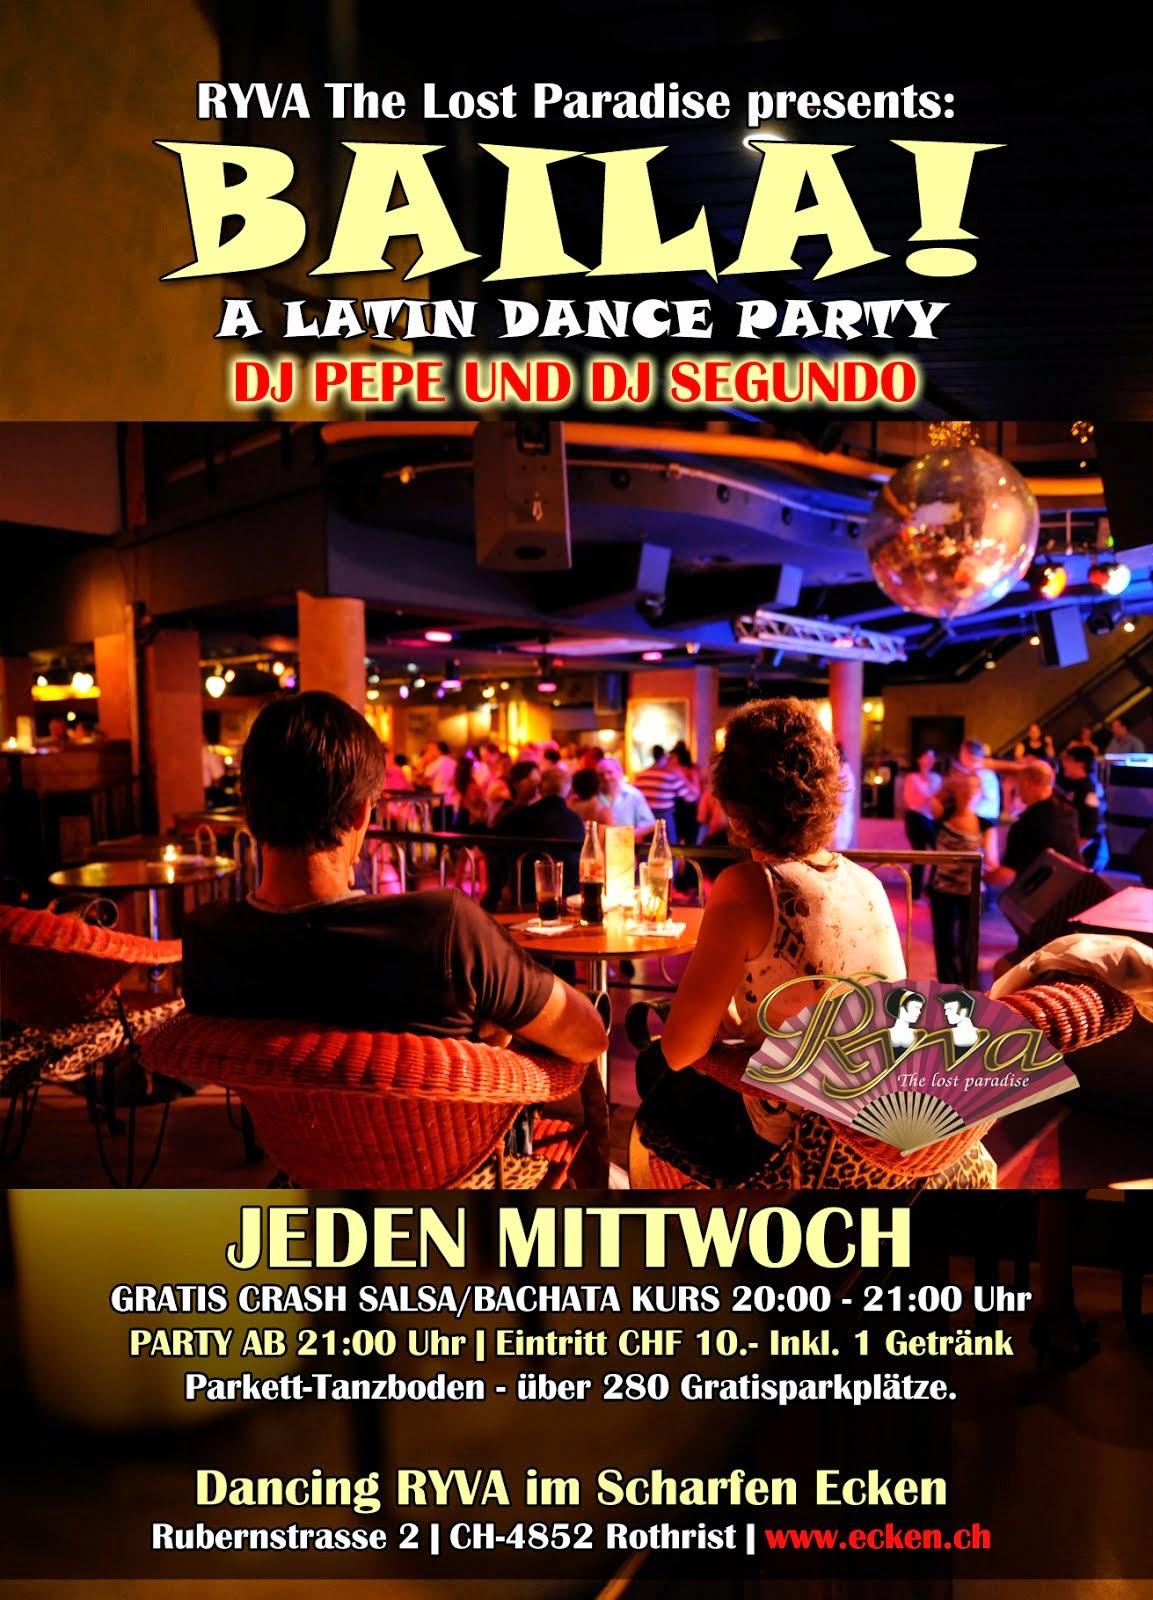 BAILA.- A LATIN DANCE PARTY